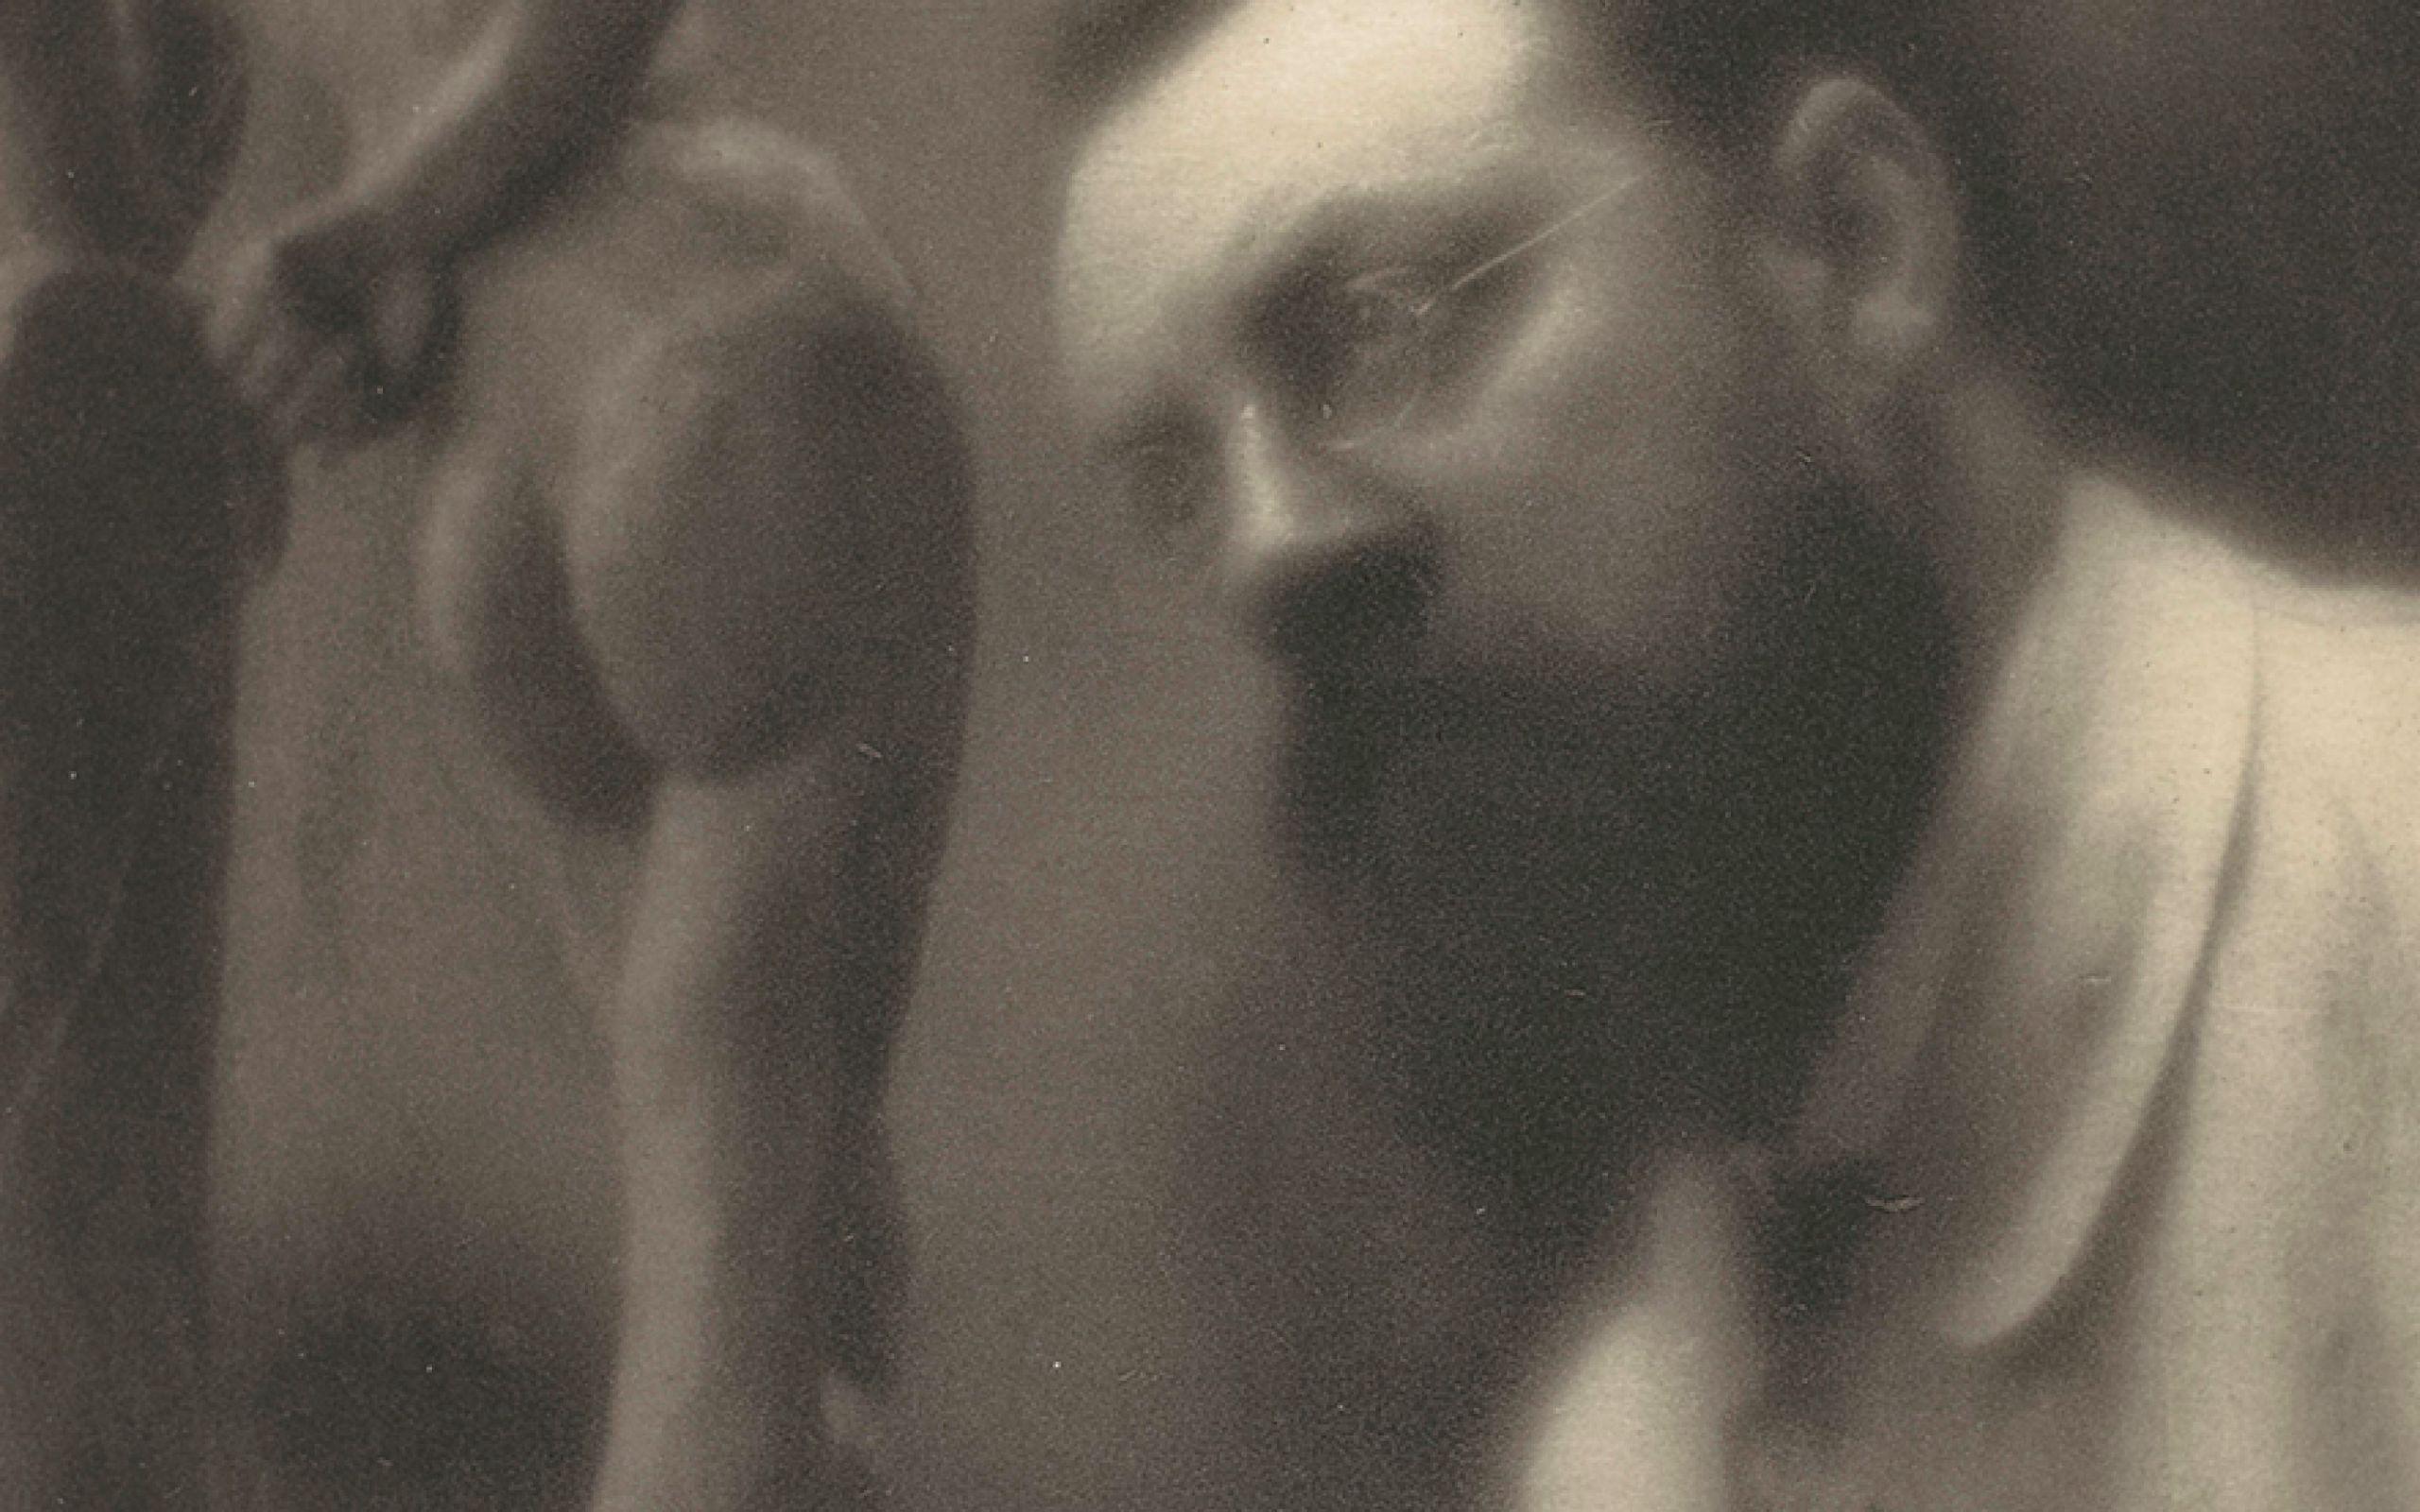 "Edward Steichen, Henri Matisse, an ""La Serpentine"" arbeitend, 1913 Fotogravüre, 22 x 17,4 cm Paris, Musée d'Orsay Inv.-Nr.: PHO1981-32-15 bpk / RMN - Grand Palais / Edward Steichen Henri Matisse © Succession H. Matisse/ VG Bild-Kunst, Bonn 2018"